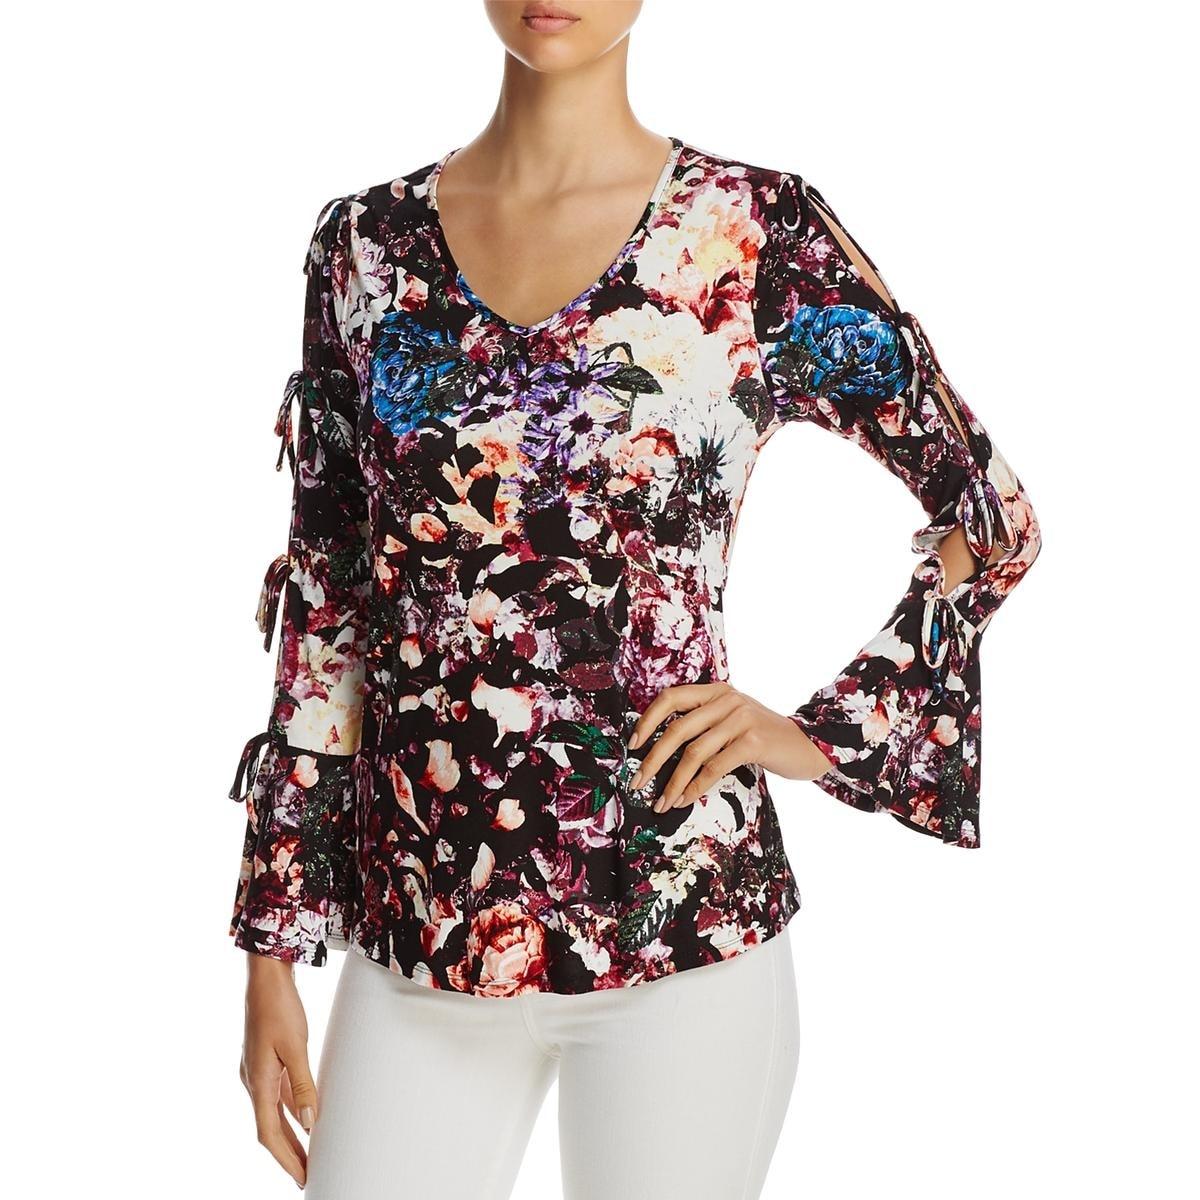 252d3ffd107 Shop Cupio Womens Casual Top Floral Print Cold Shoulder - Free ...